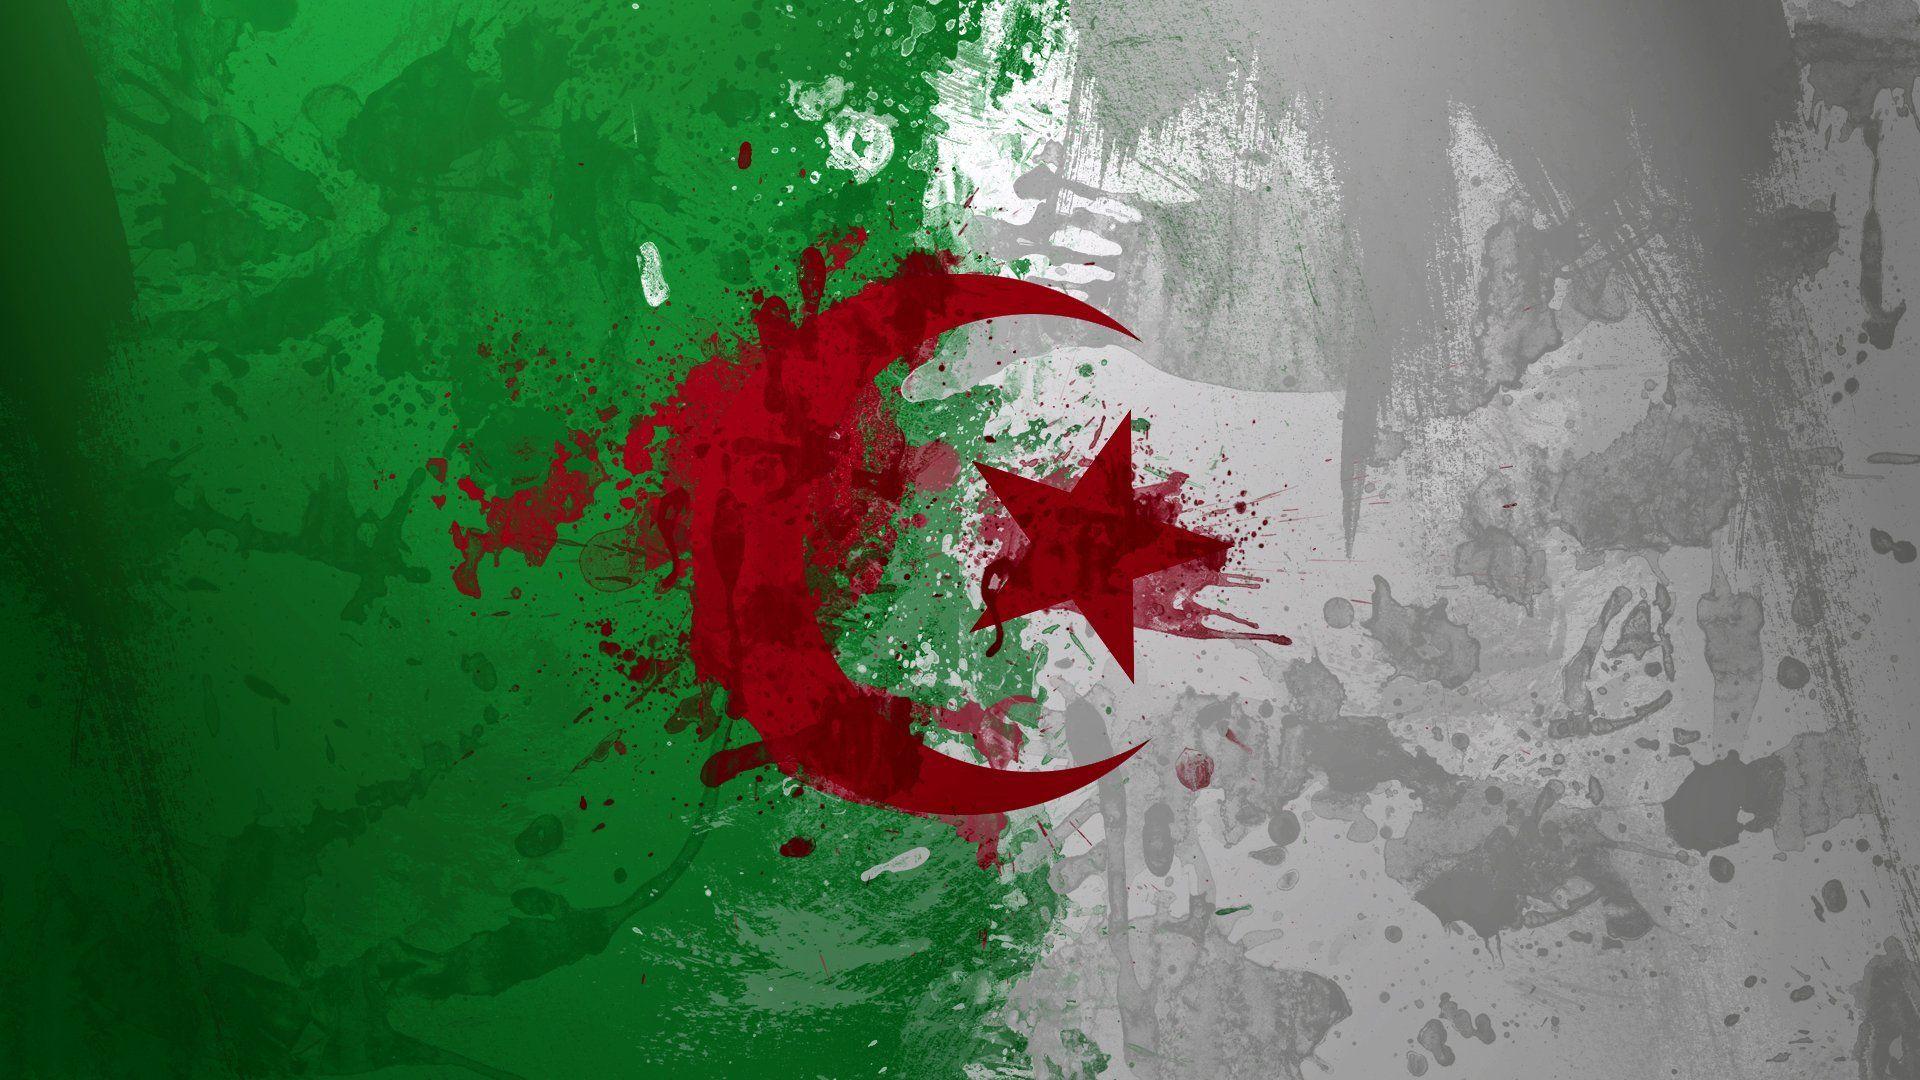 Top HD Algeria Flag Wallpaper Travelling HD 30138 KB 1920x1080